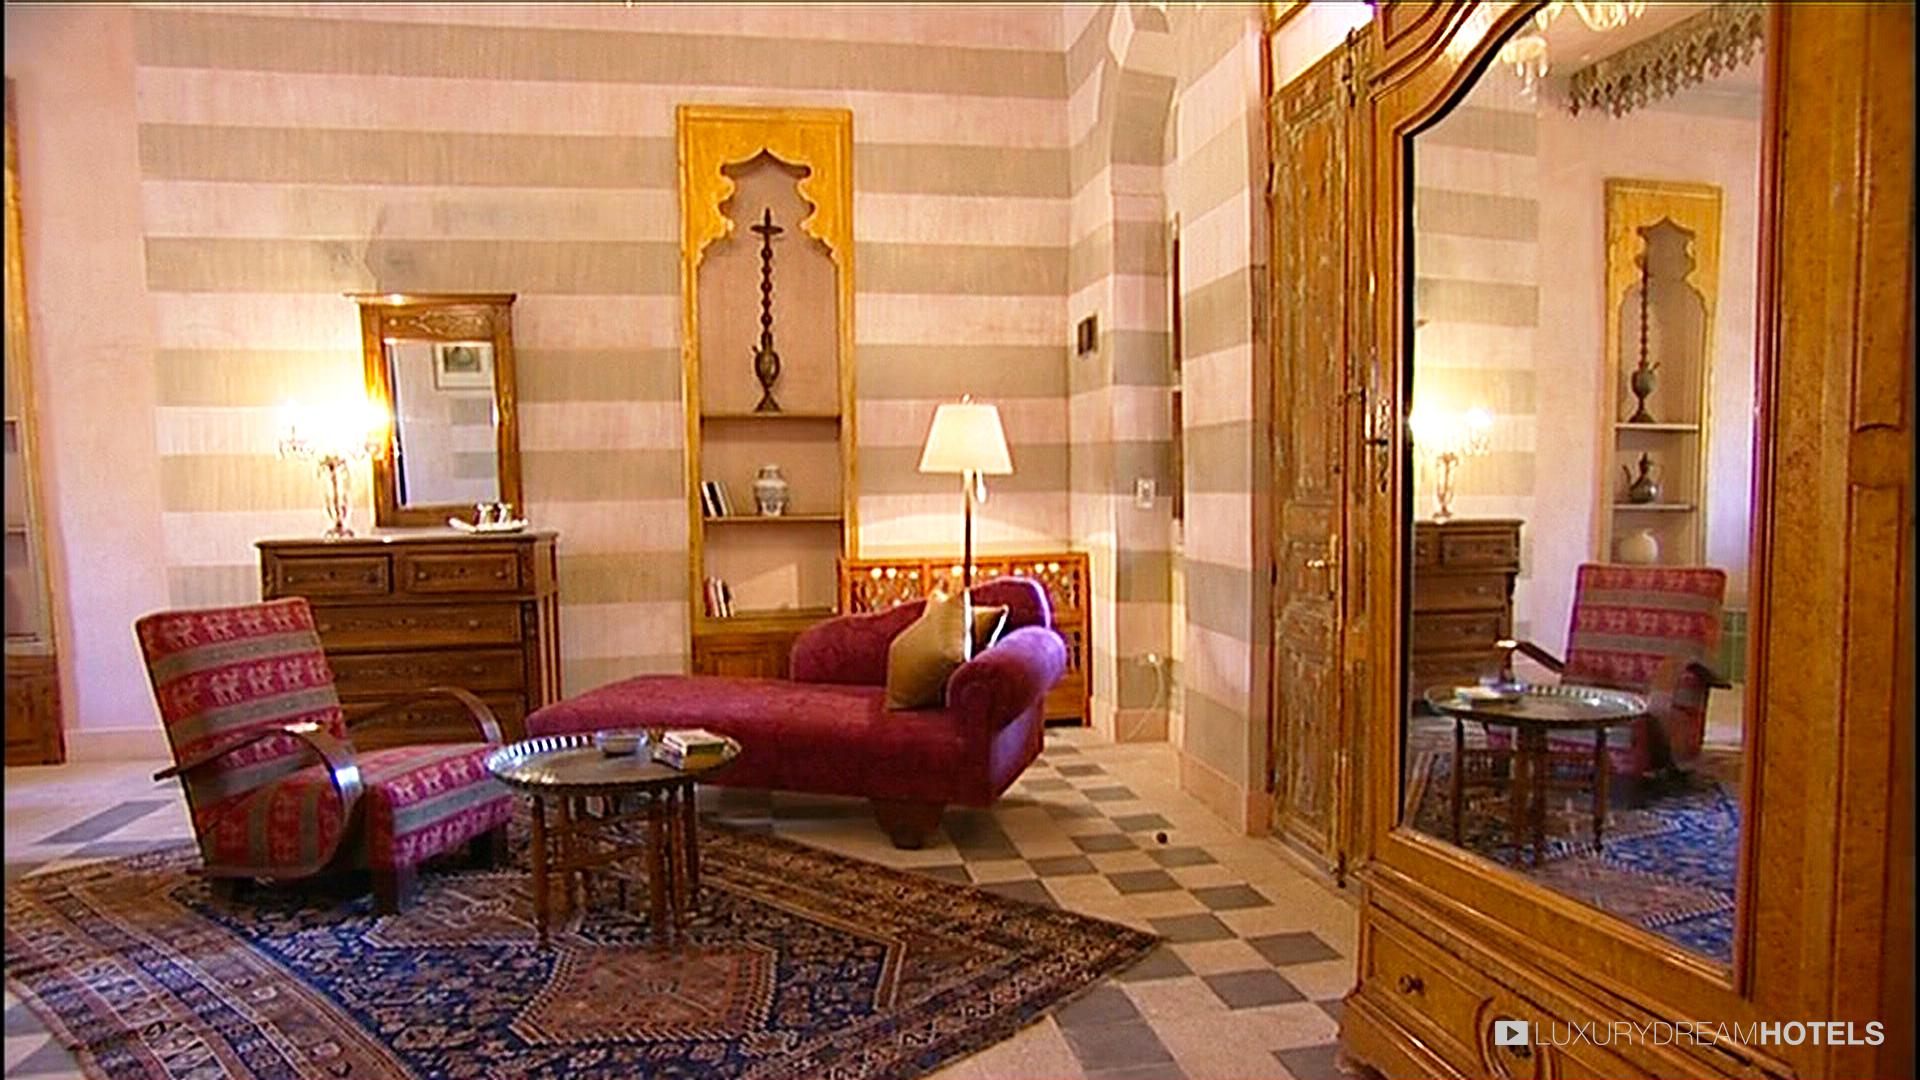 One Bedroom Luxury Suite Luxor Luxury Hotel Hotel Al Moudira Luxor Luxor Egypt Luxury Dream